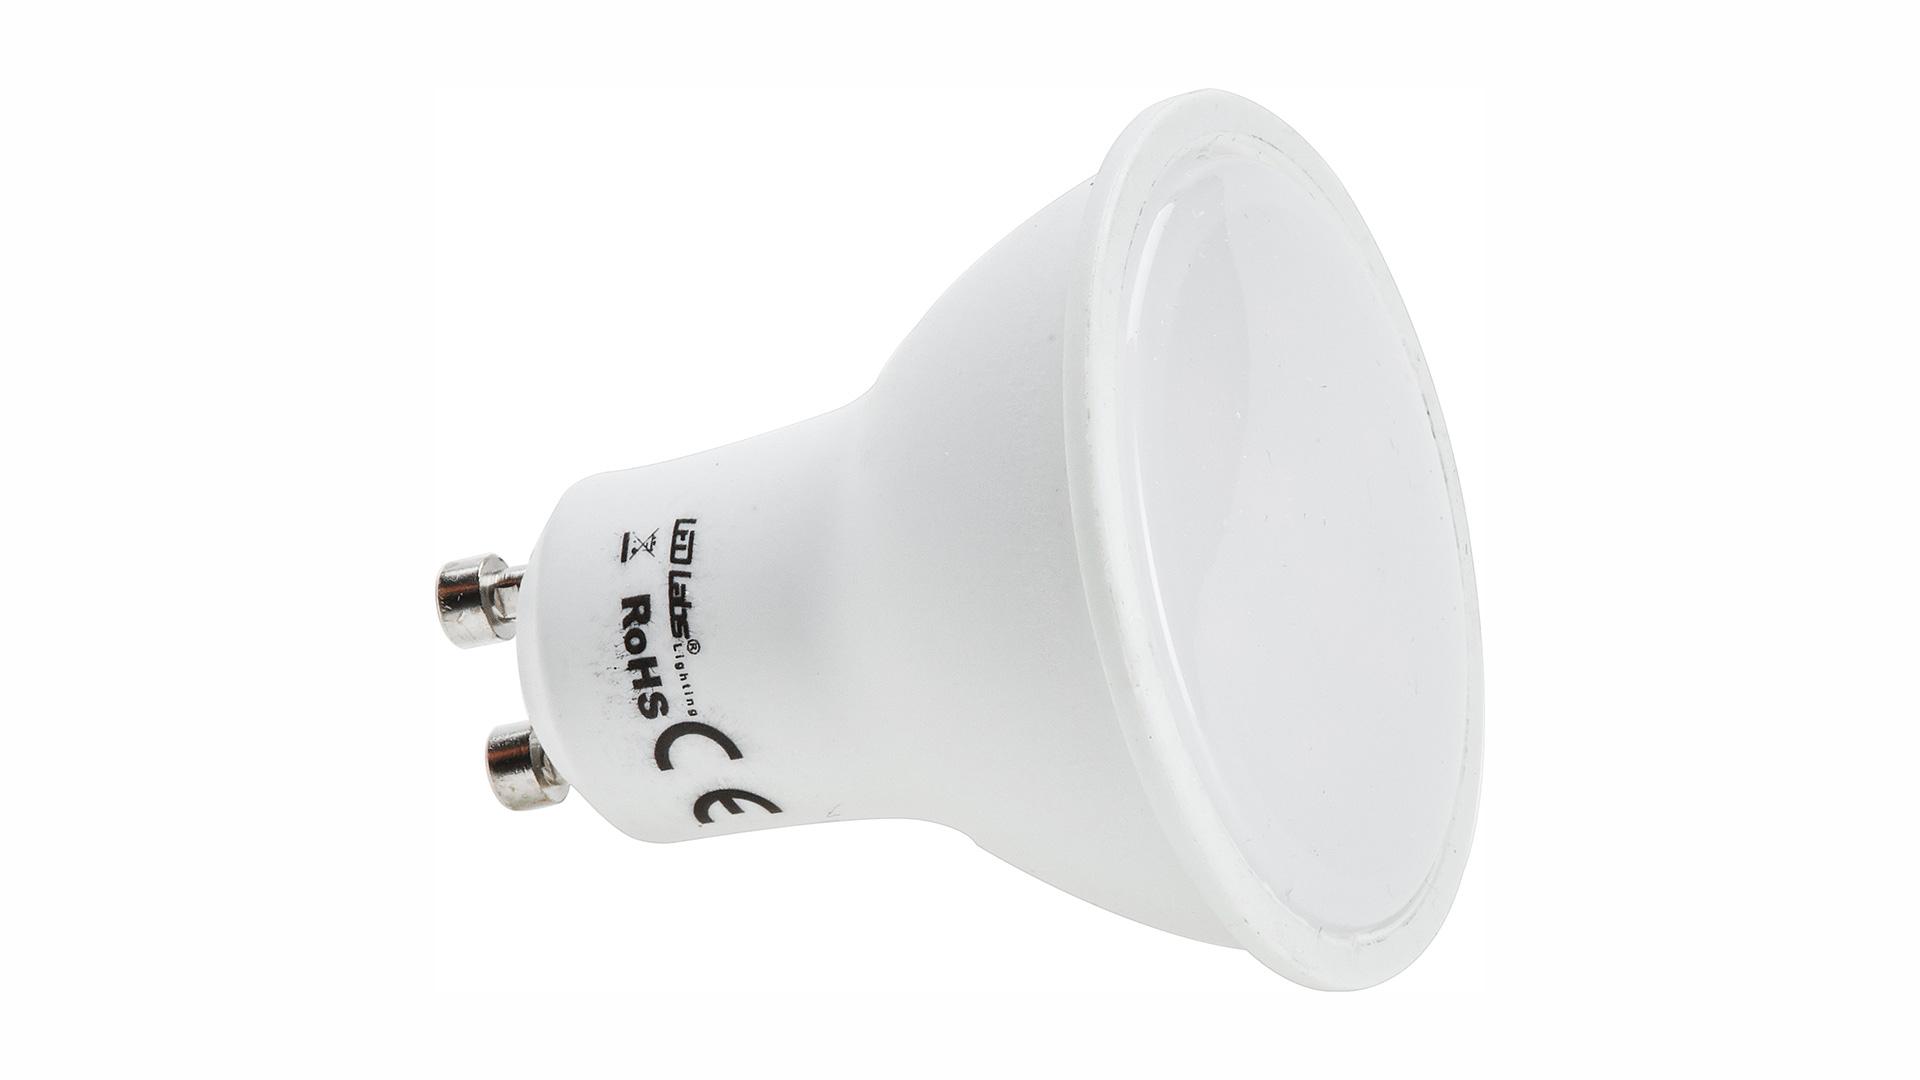 LED source GU10 7W Neutral white